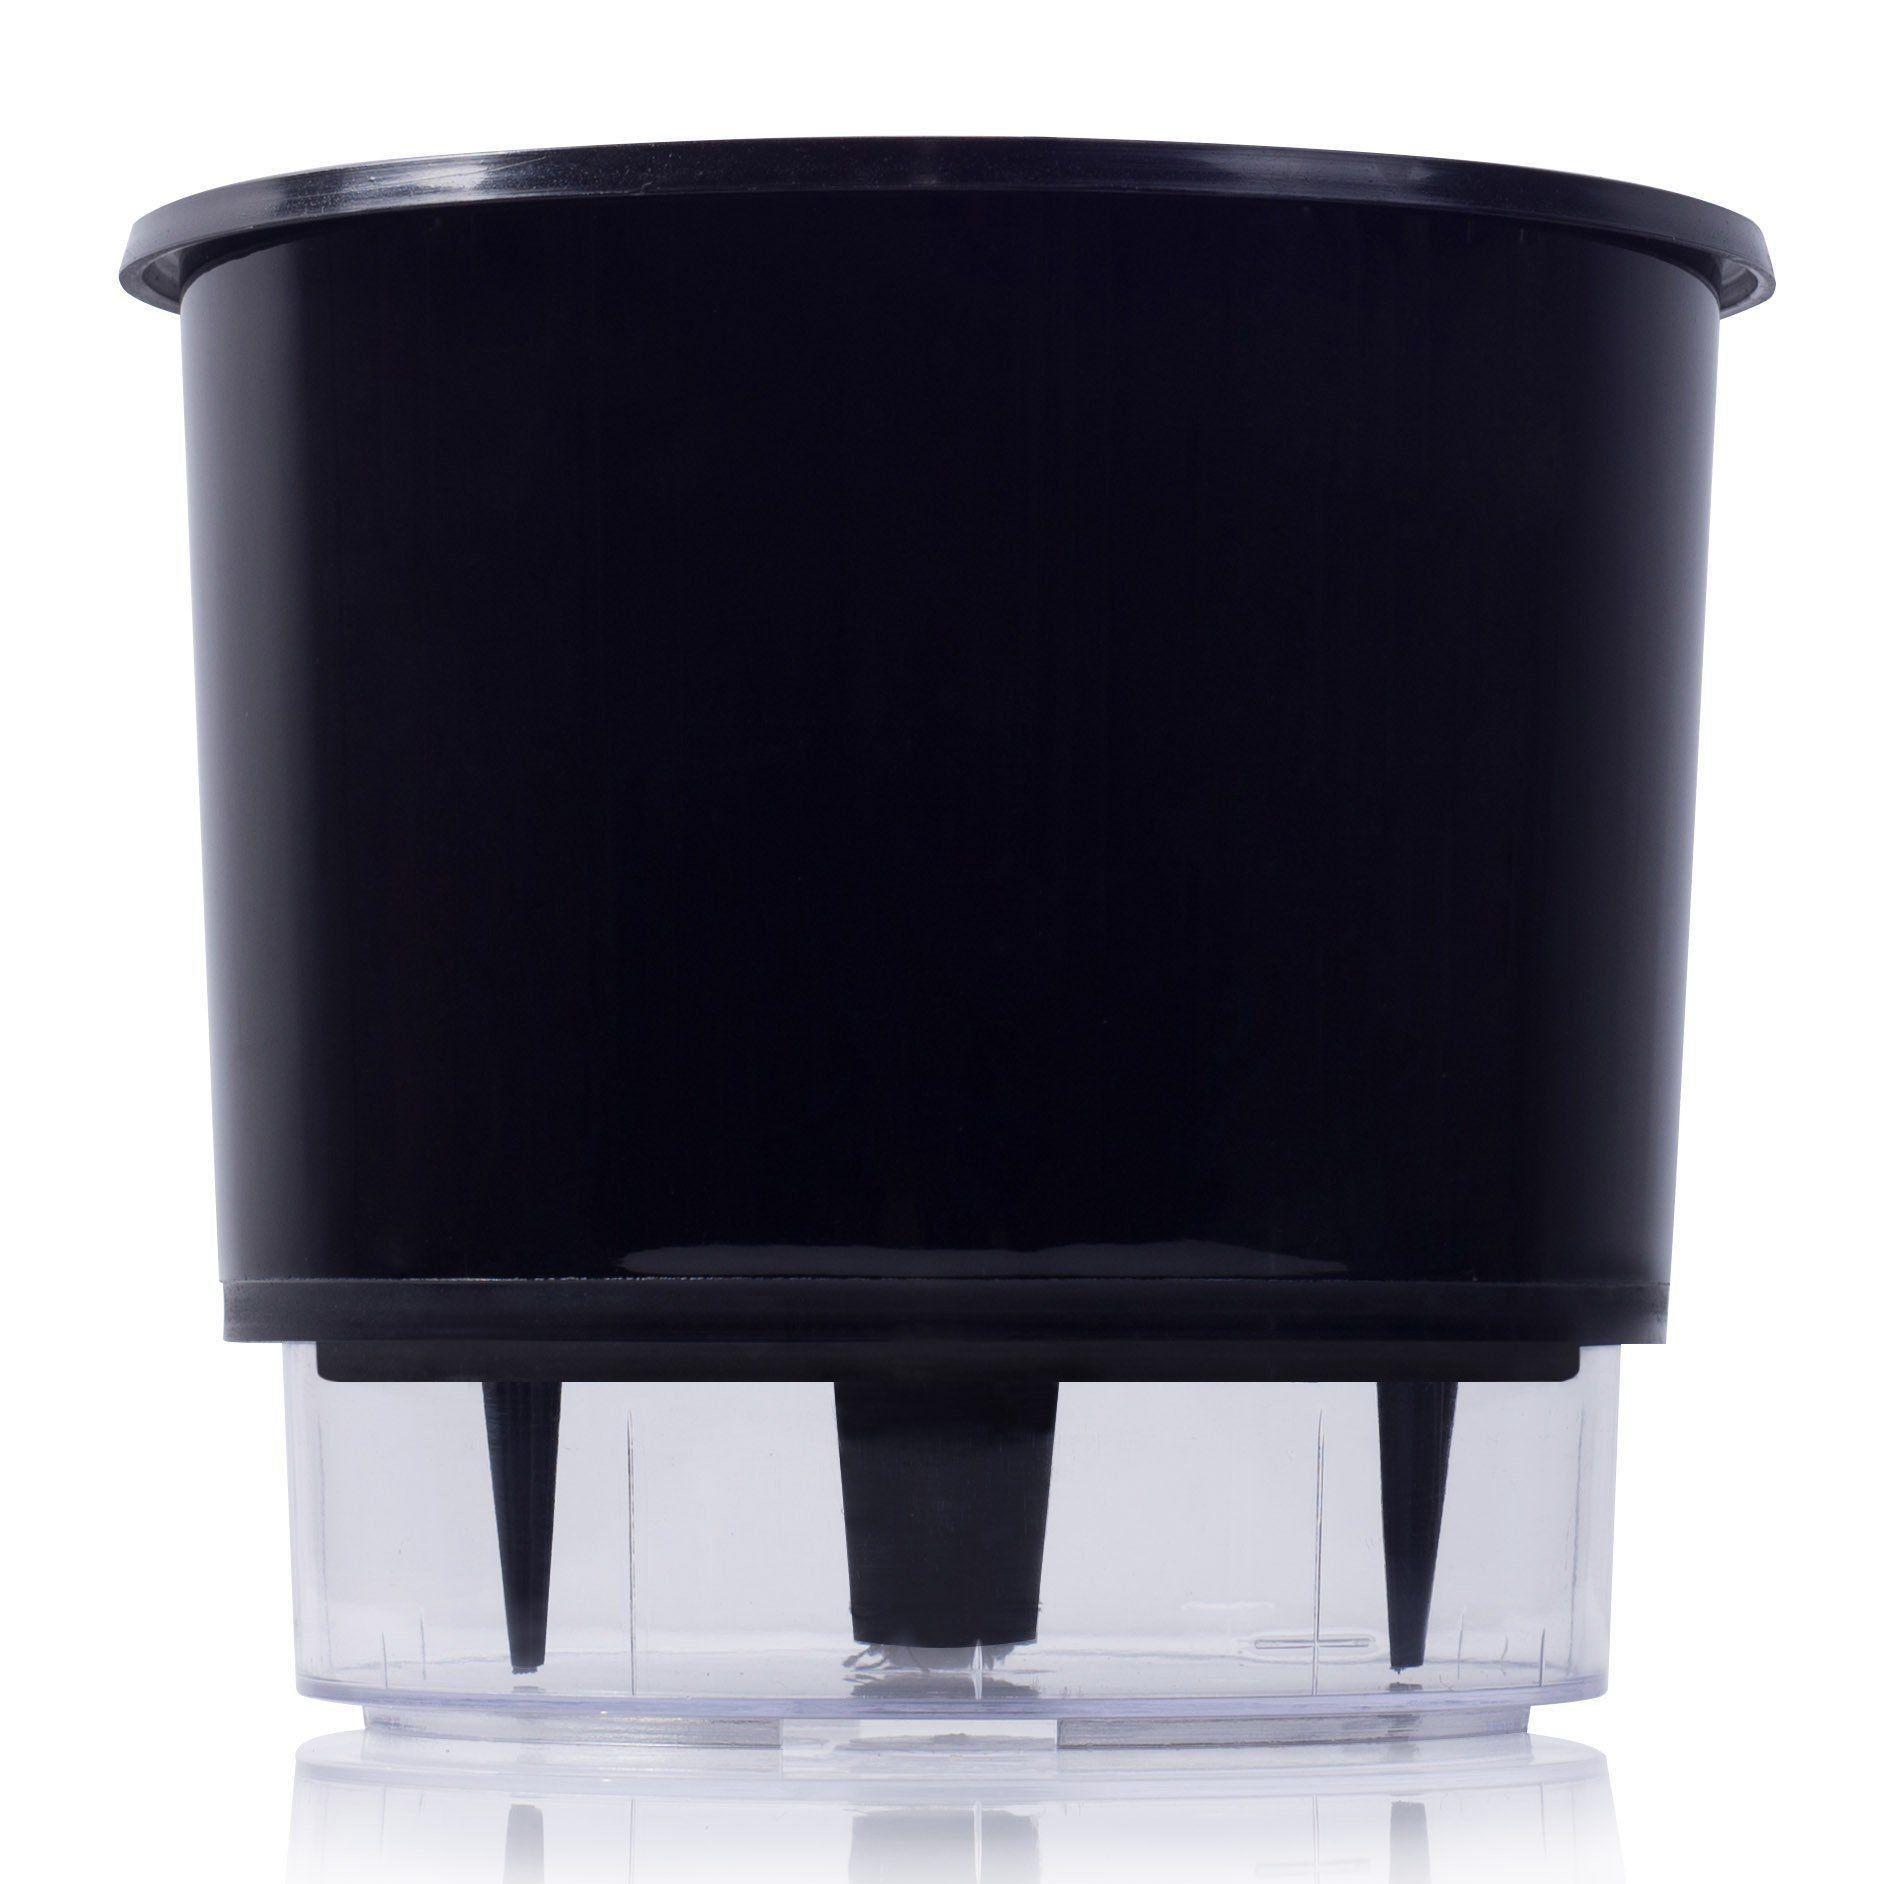 Vaso Autoirrigável 03 Preto